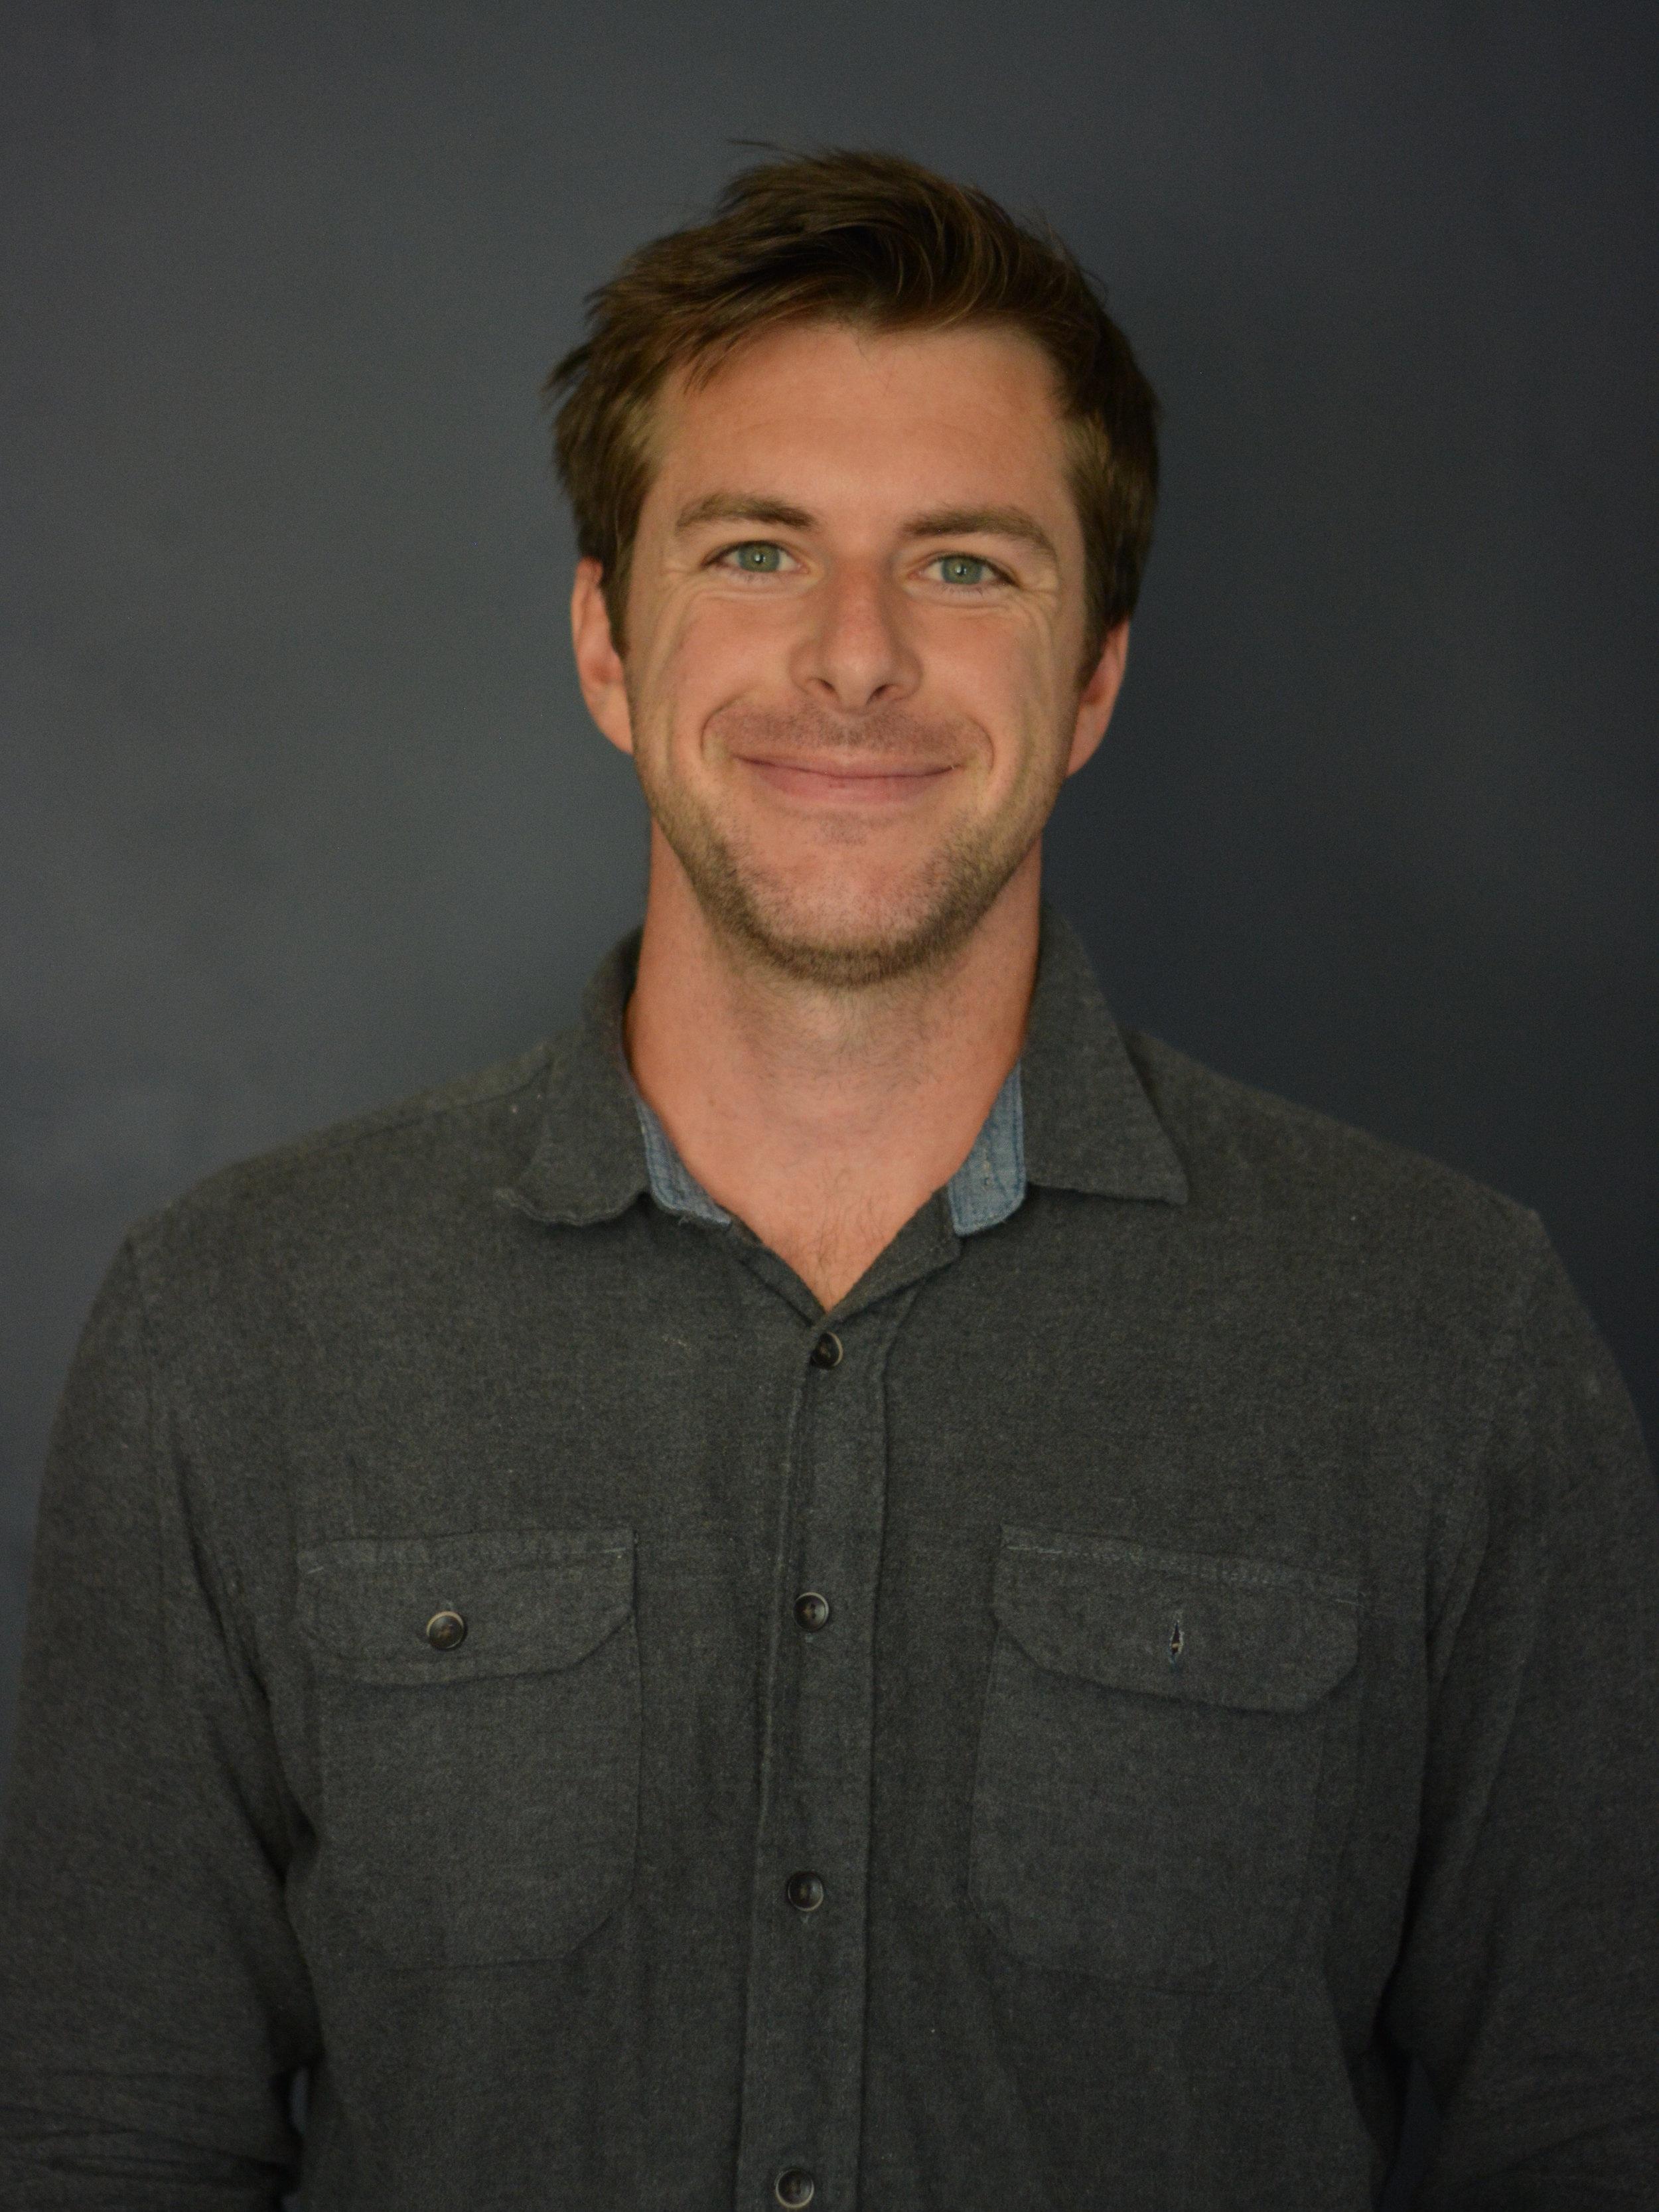 Christoph Moore - Chemical Engineer